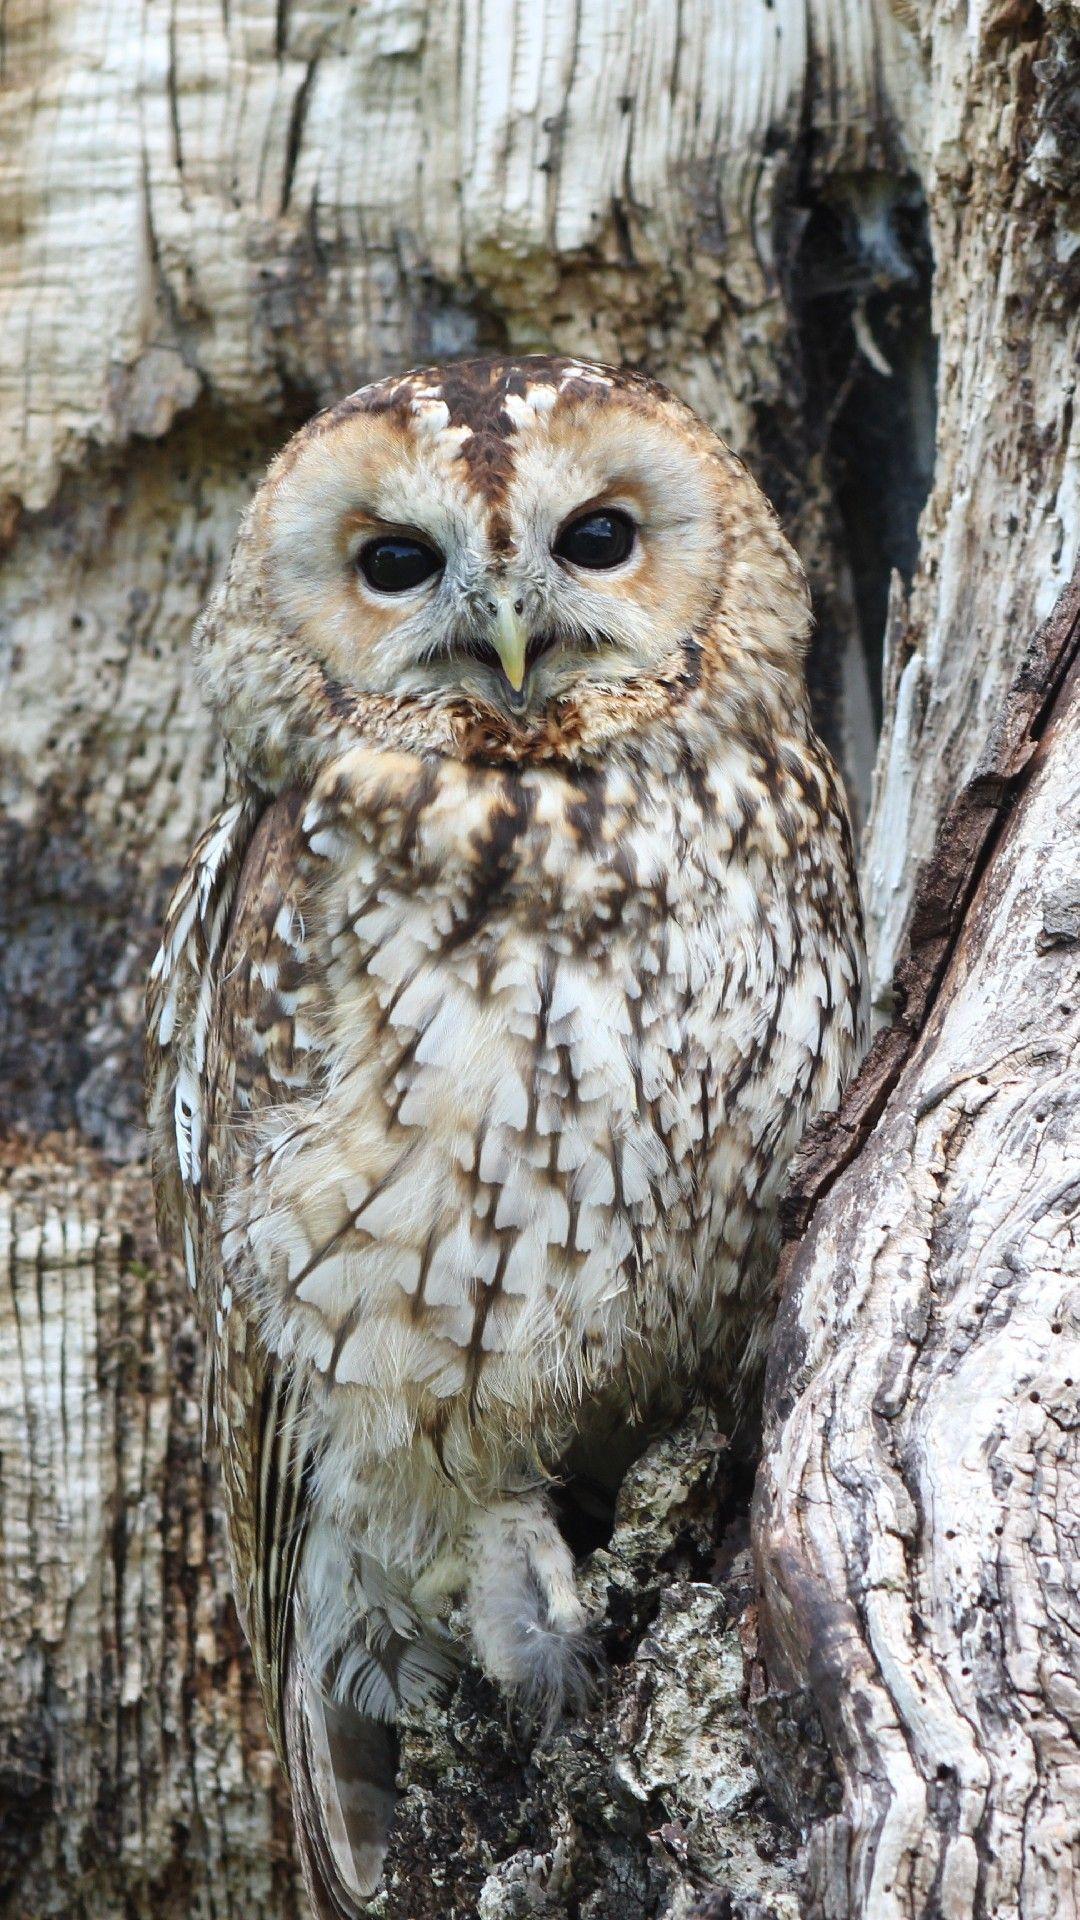 Owls Nest Phone Wallpaper Lockscreen HD 4K Android iOS